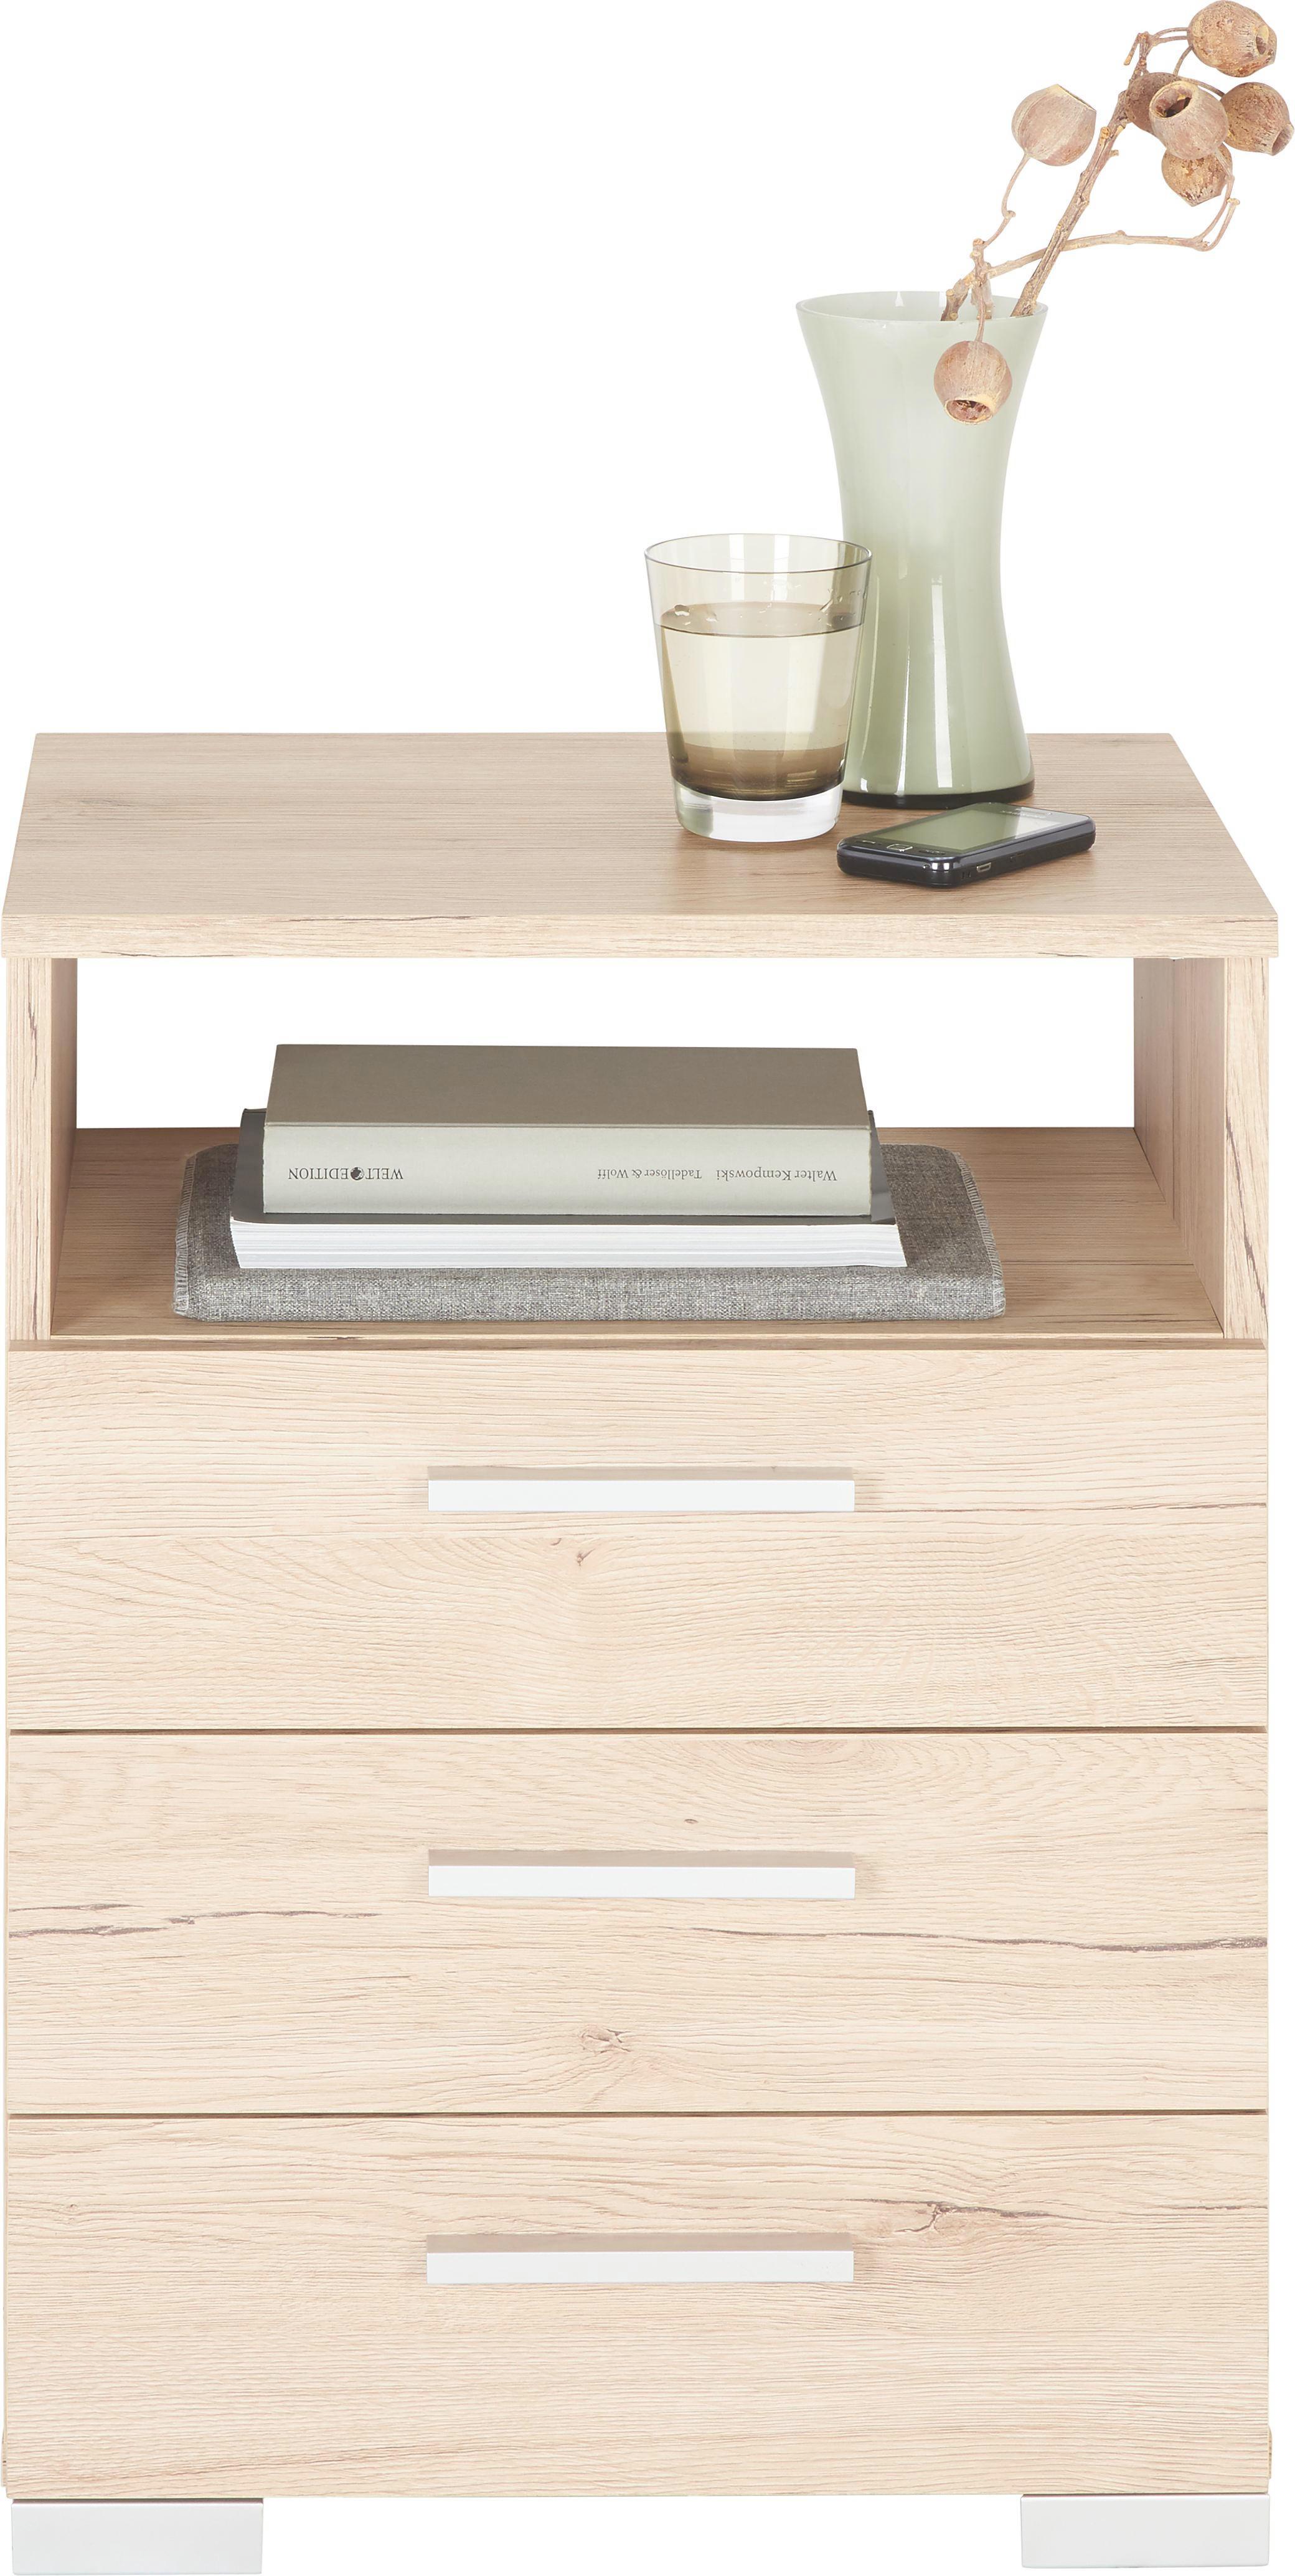 SÄNGBORD - alufärgad/ekfärgad, Design, träbaserade material/plast (45/62/35cm) - Carryhome